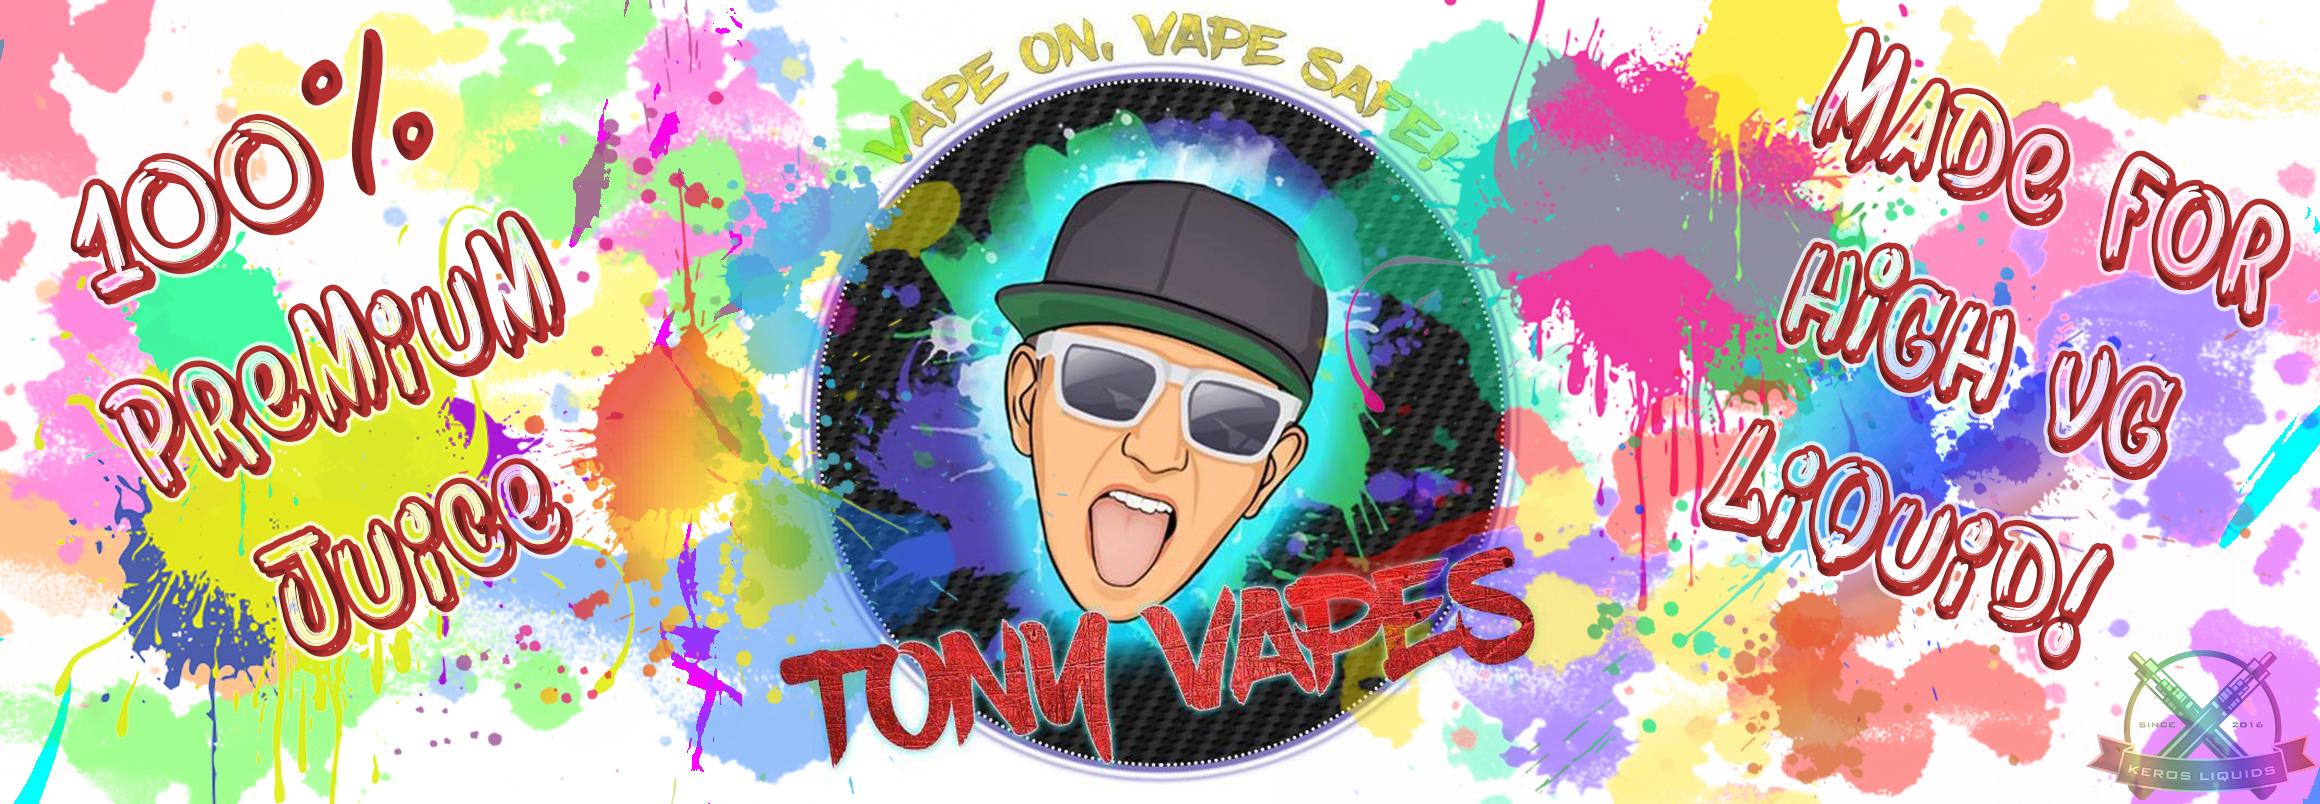 Tony-Vapes-TNYVPS-Banner-KerosLiquids